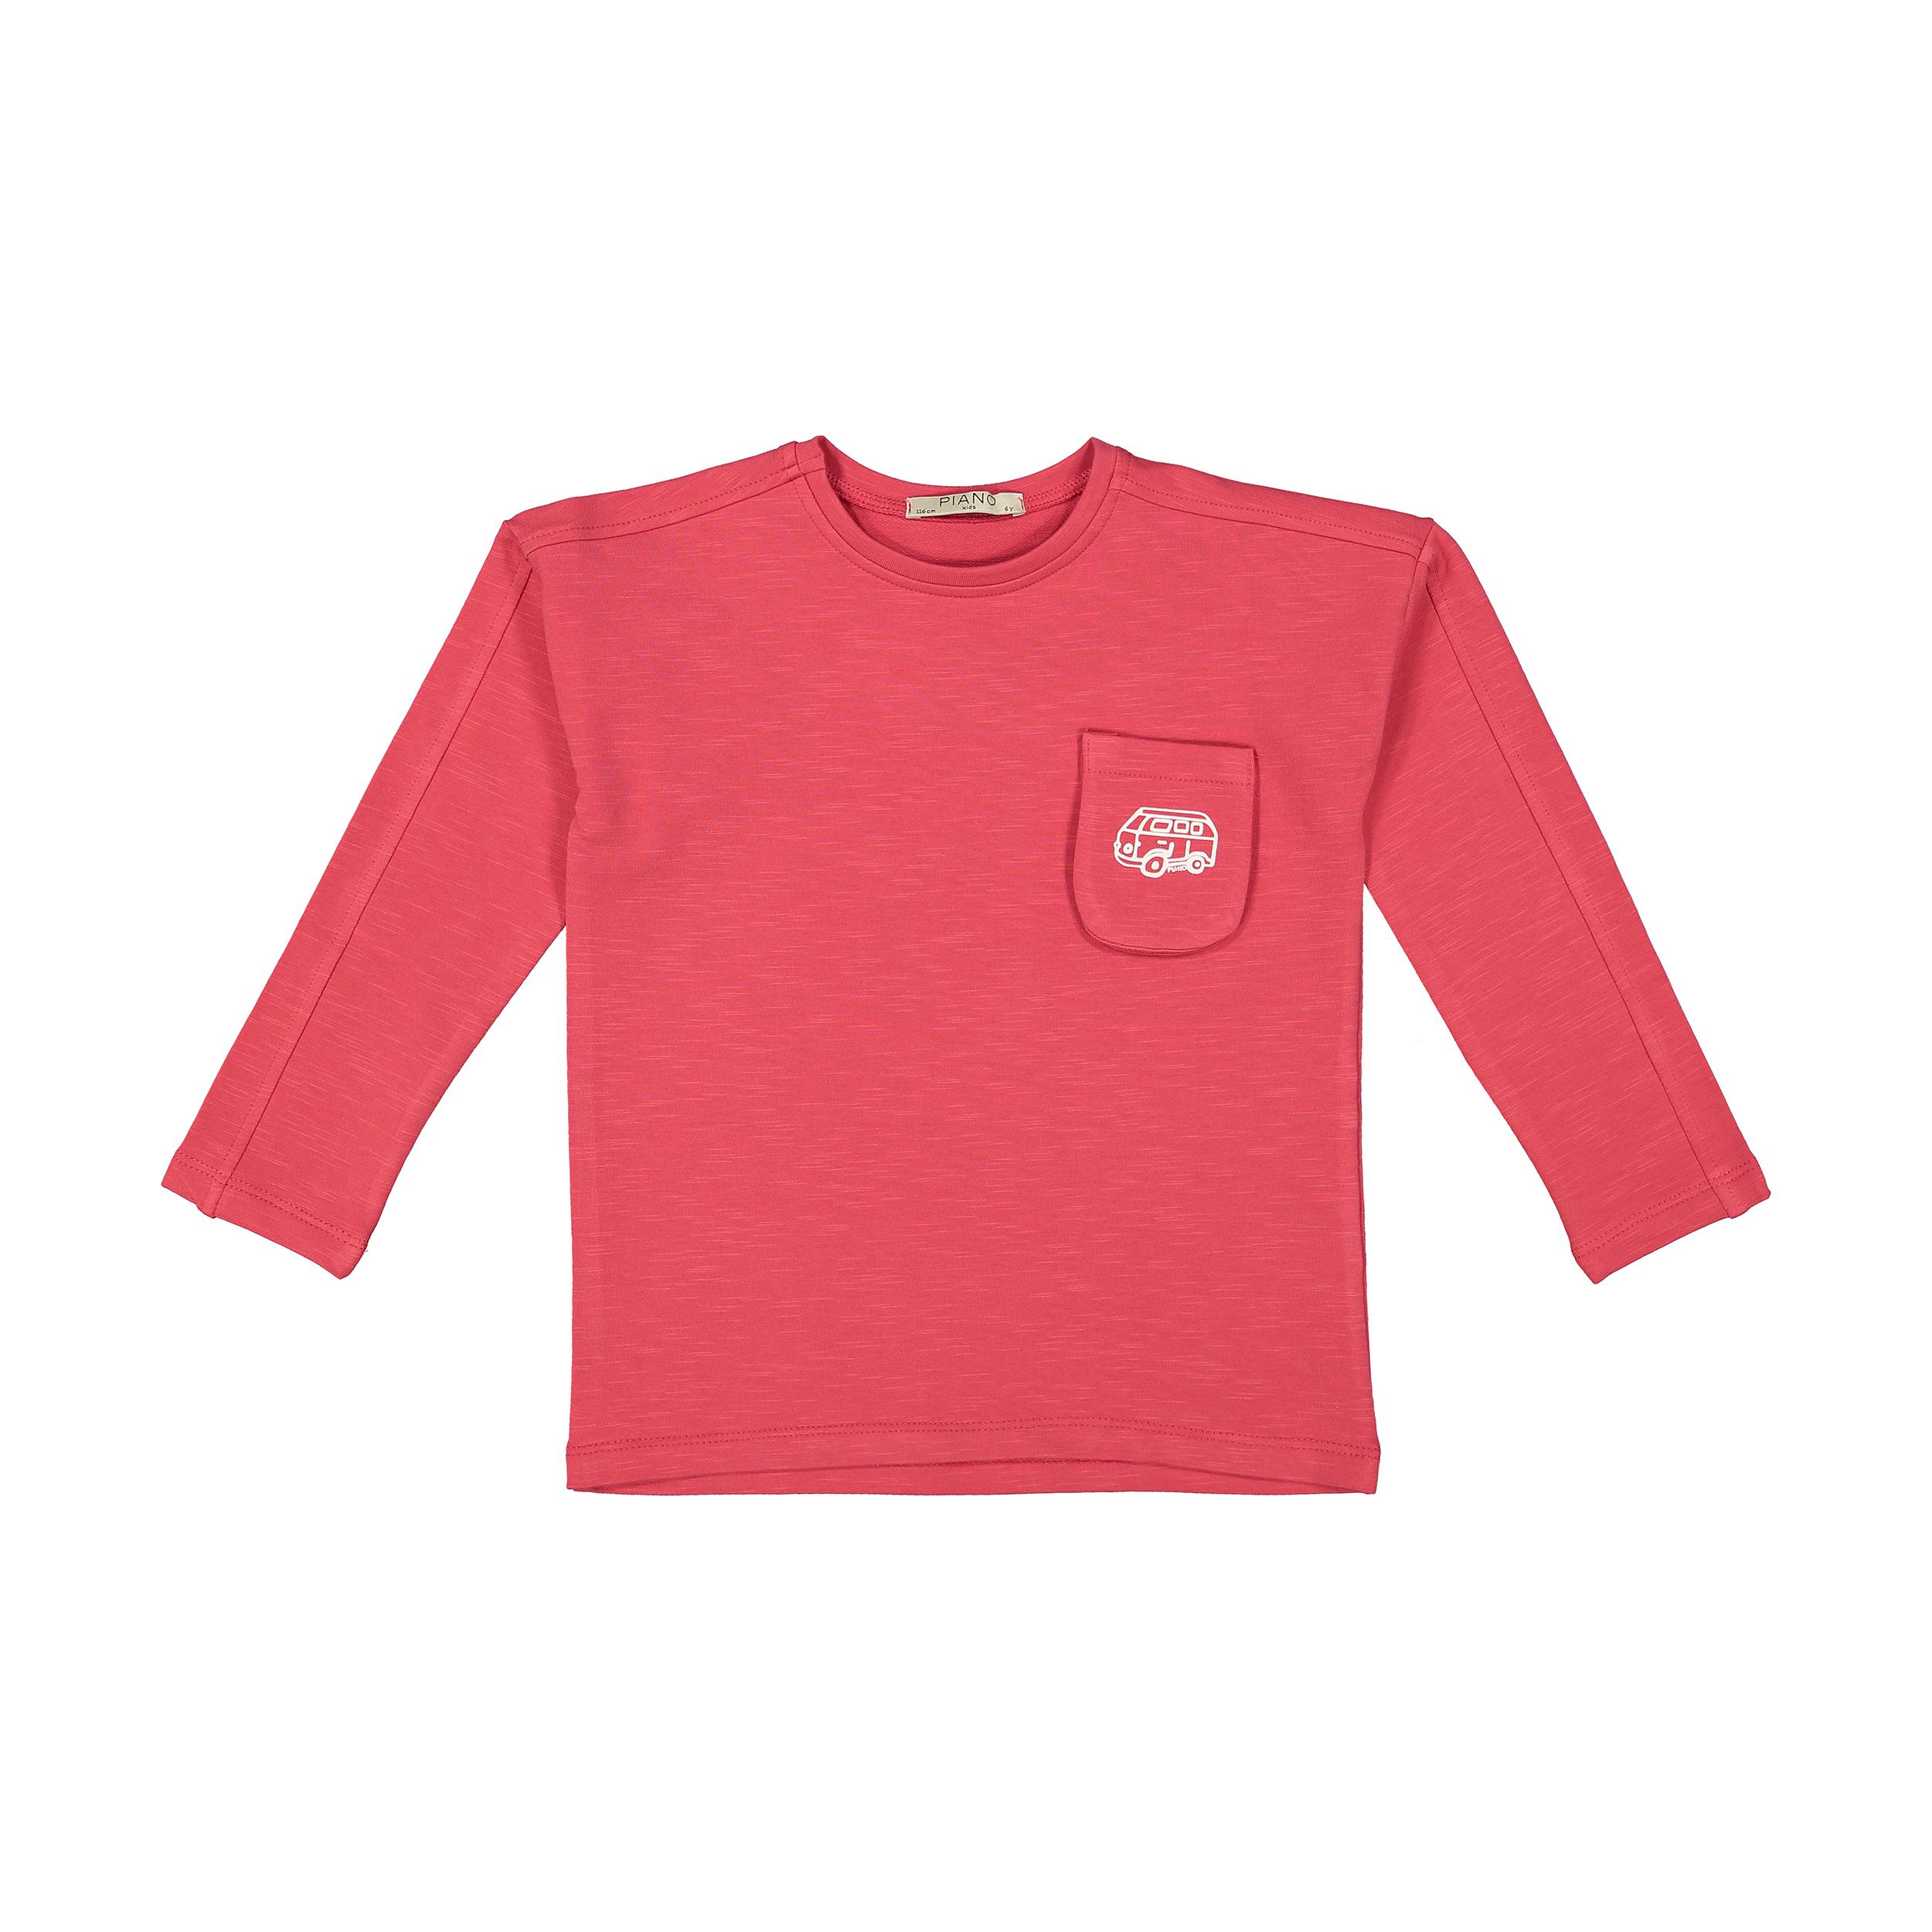 تی شرت پسرانه پیانو مدل 1009009801303-72